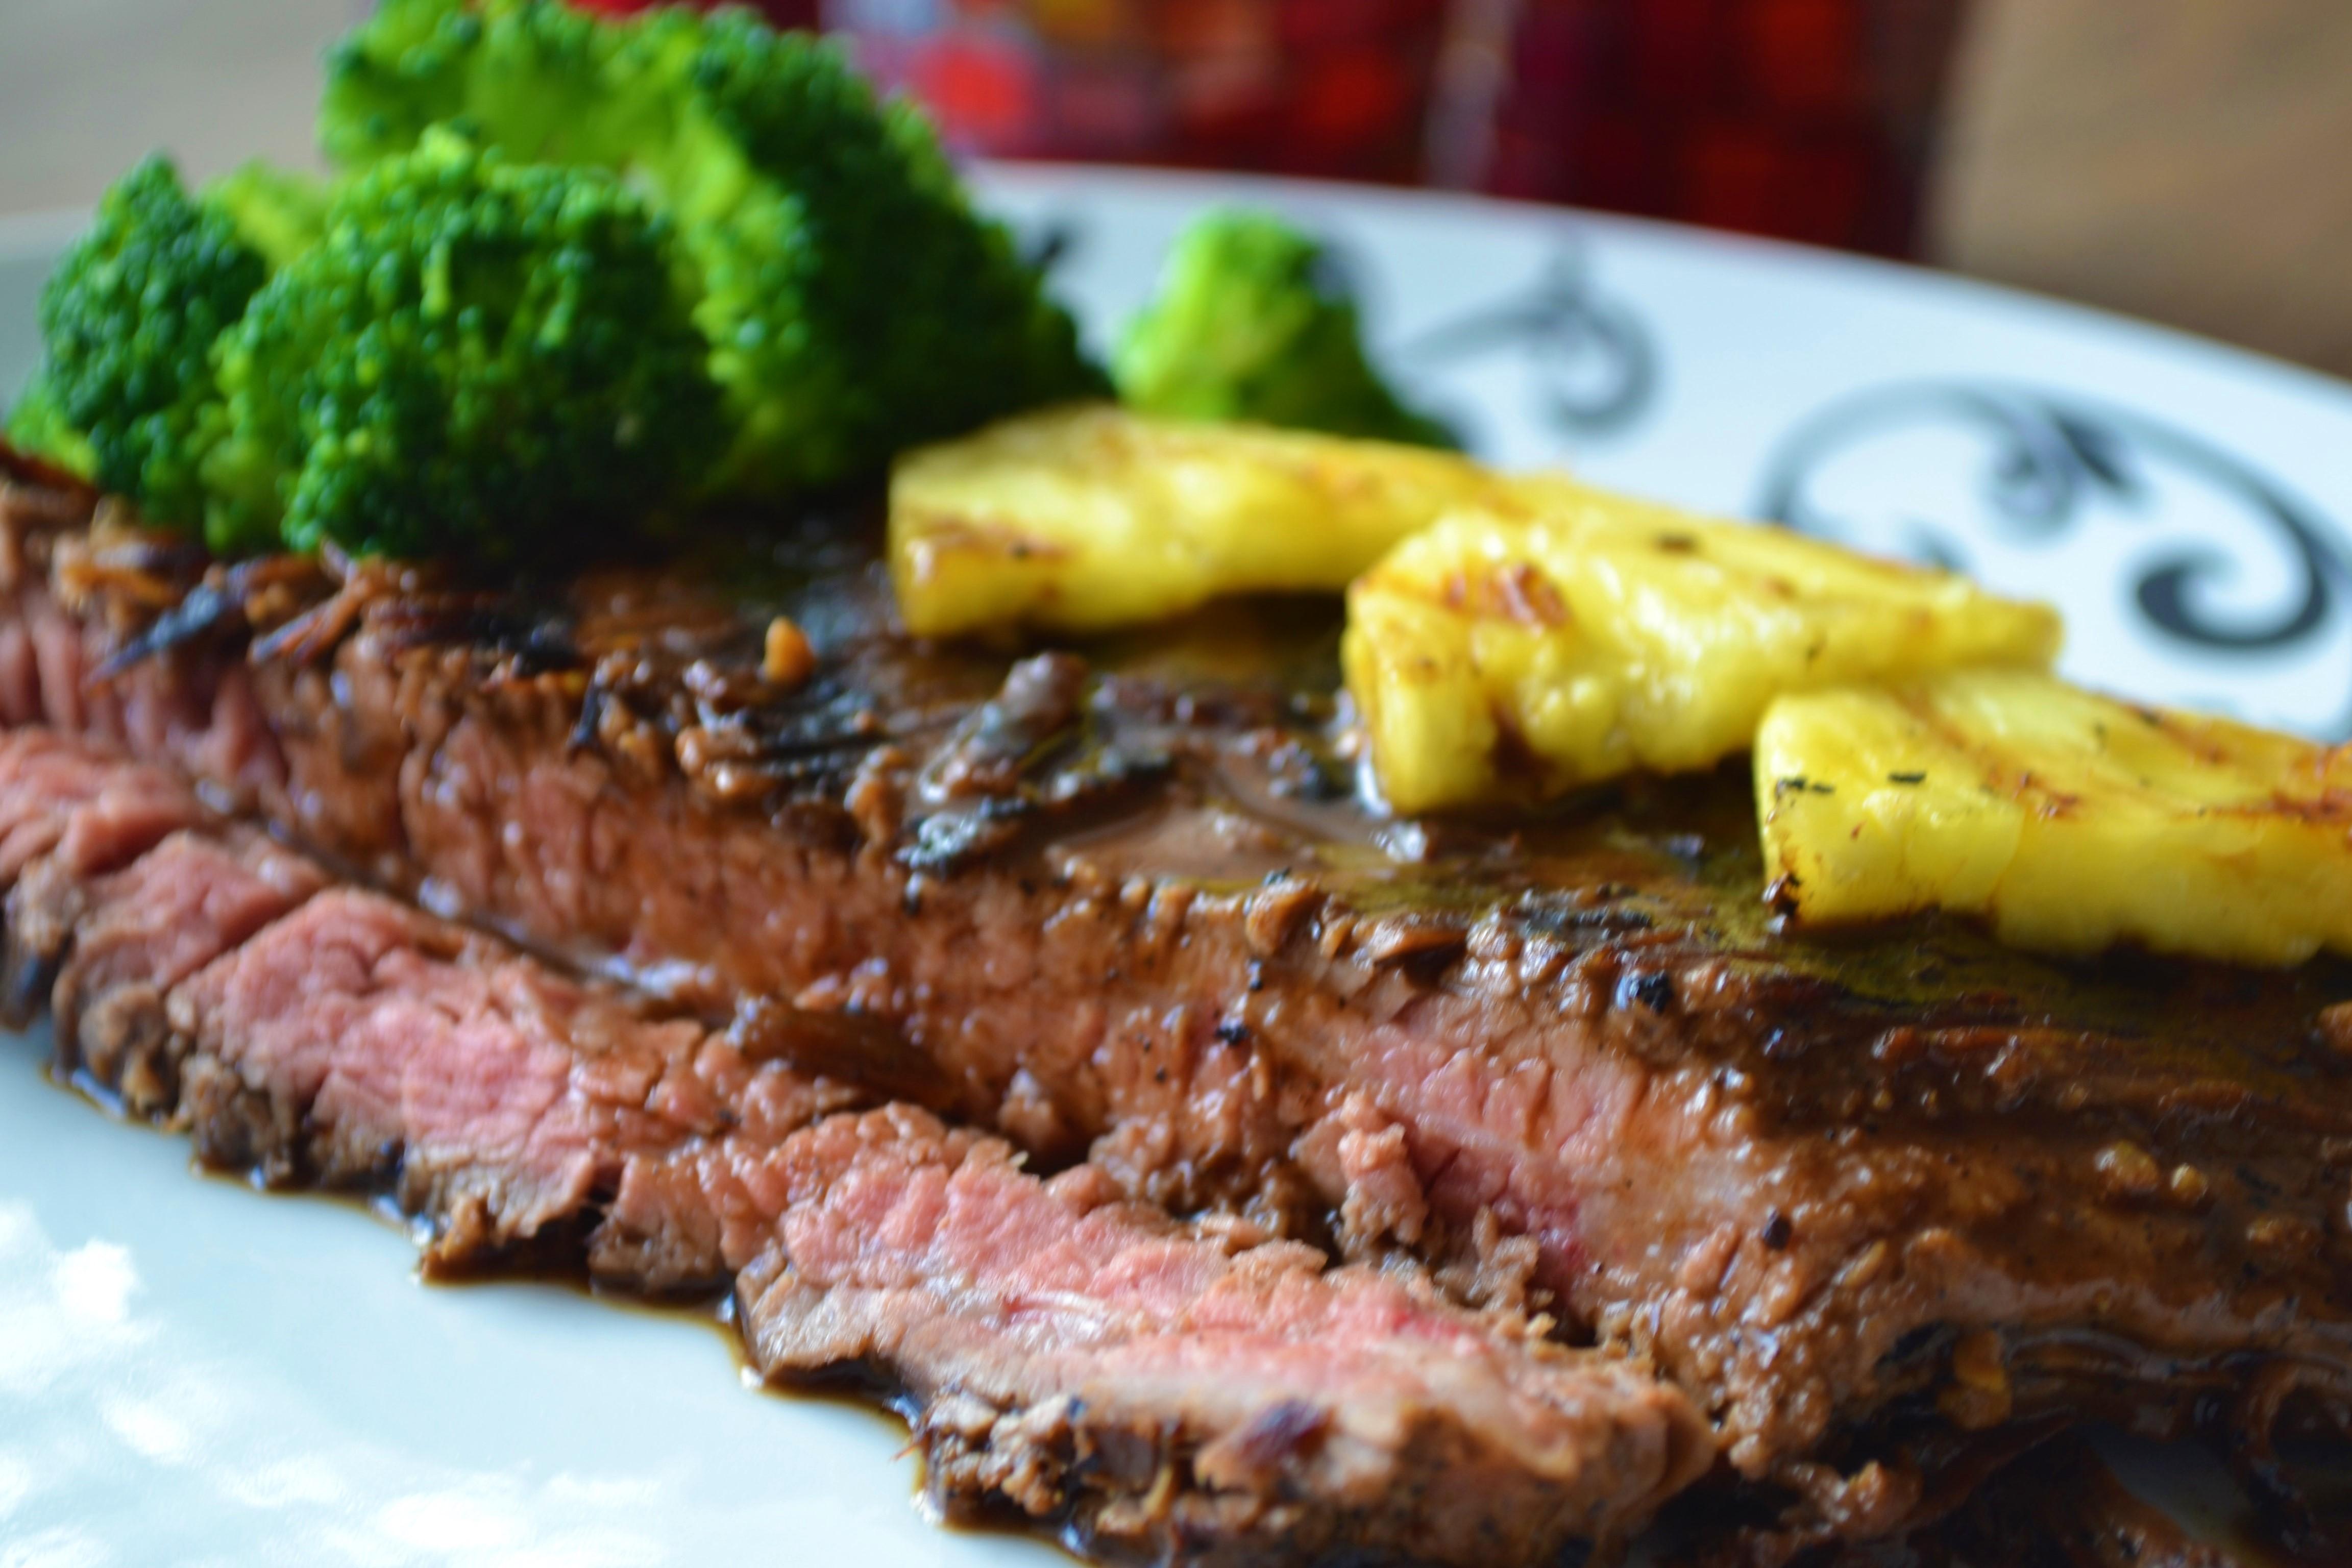 Perfect Grilled Steak 1 flank steak. grill seasoning